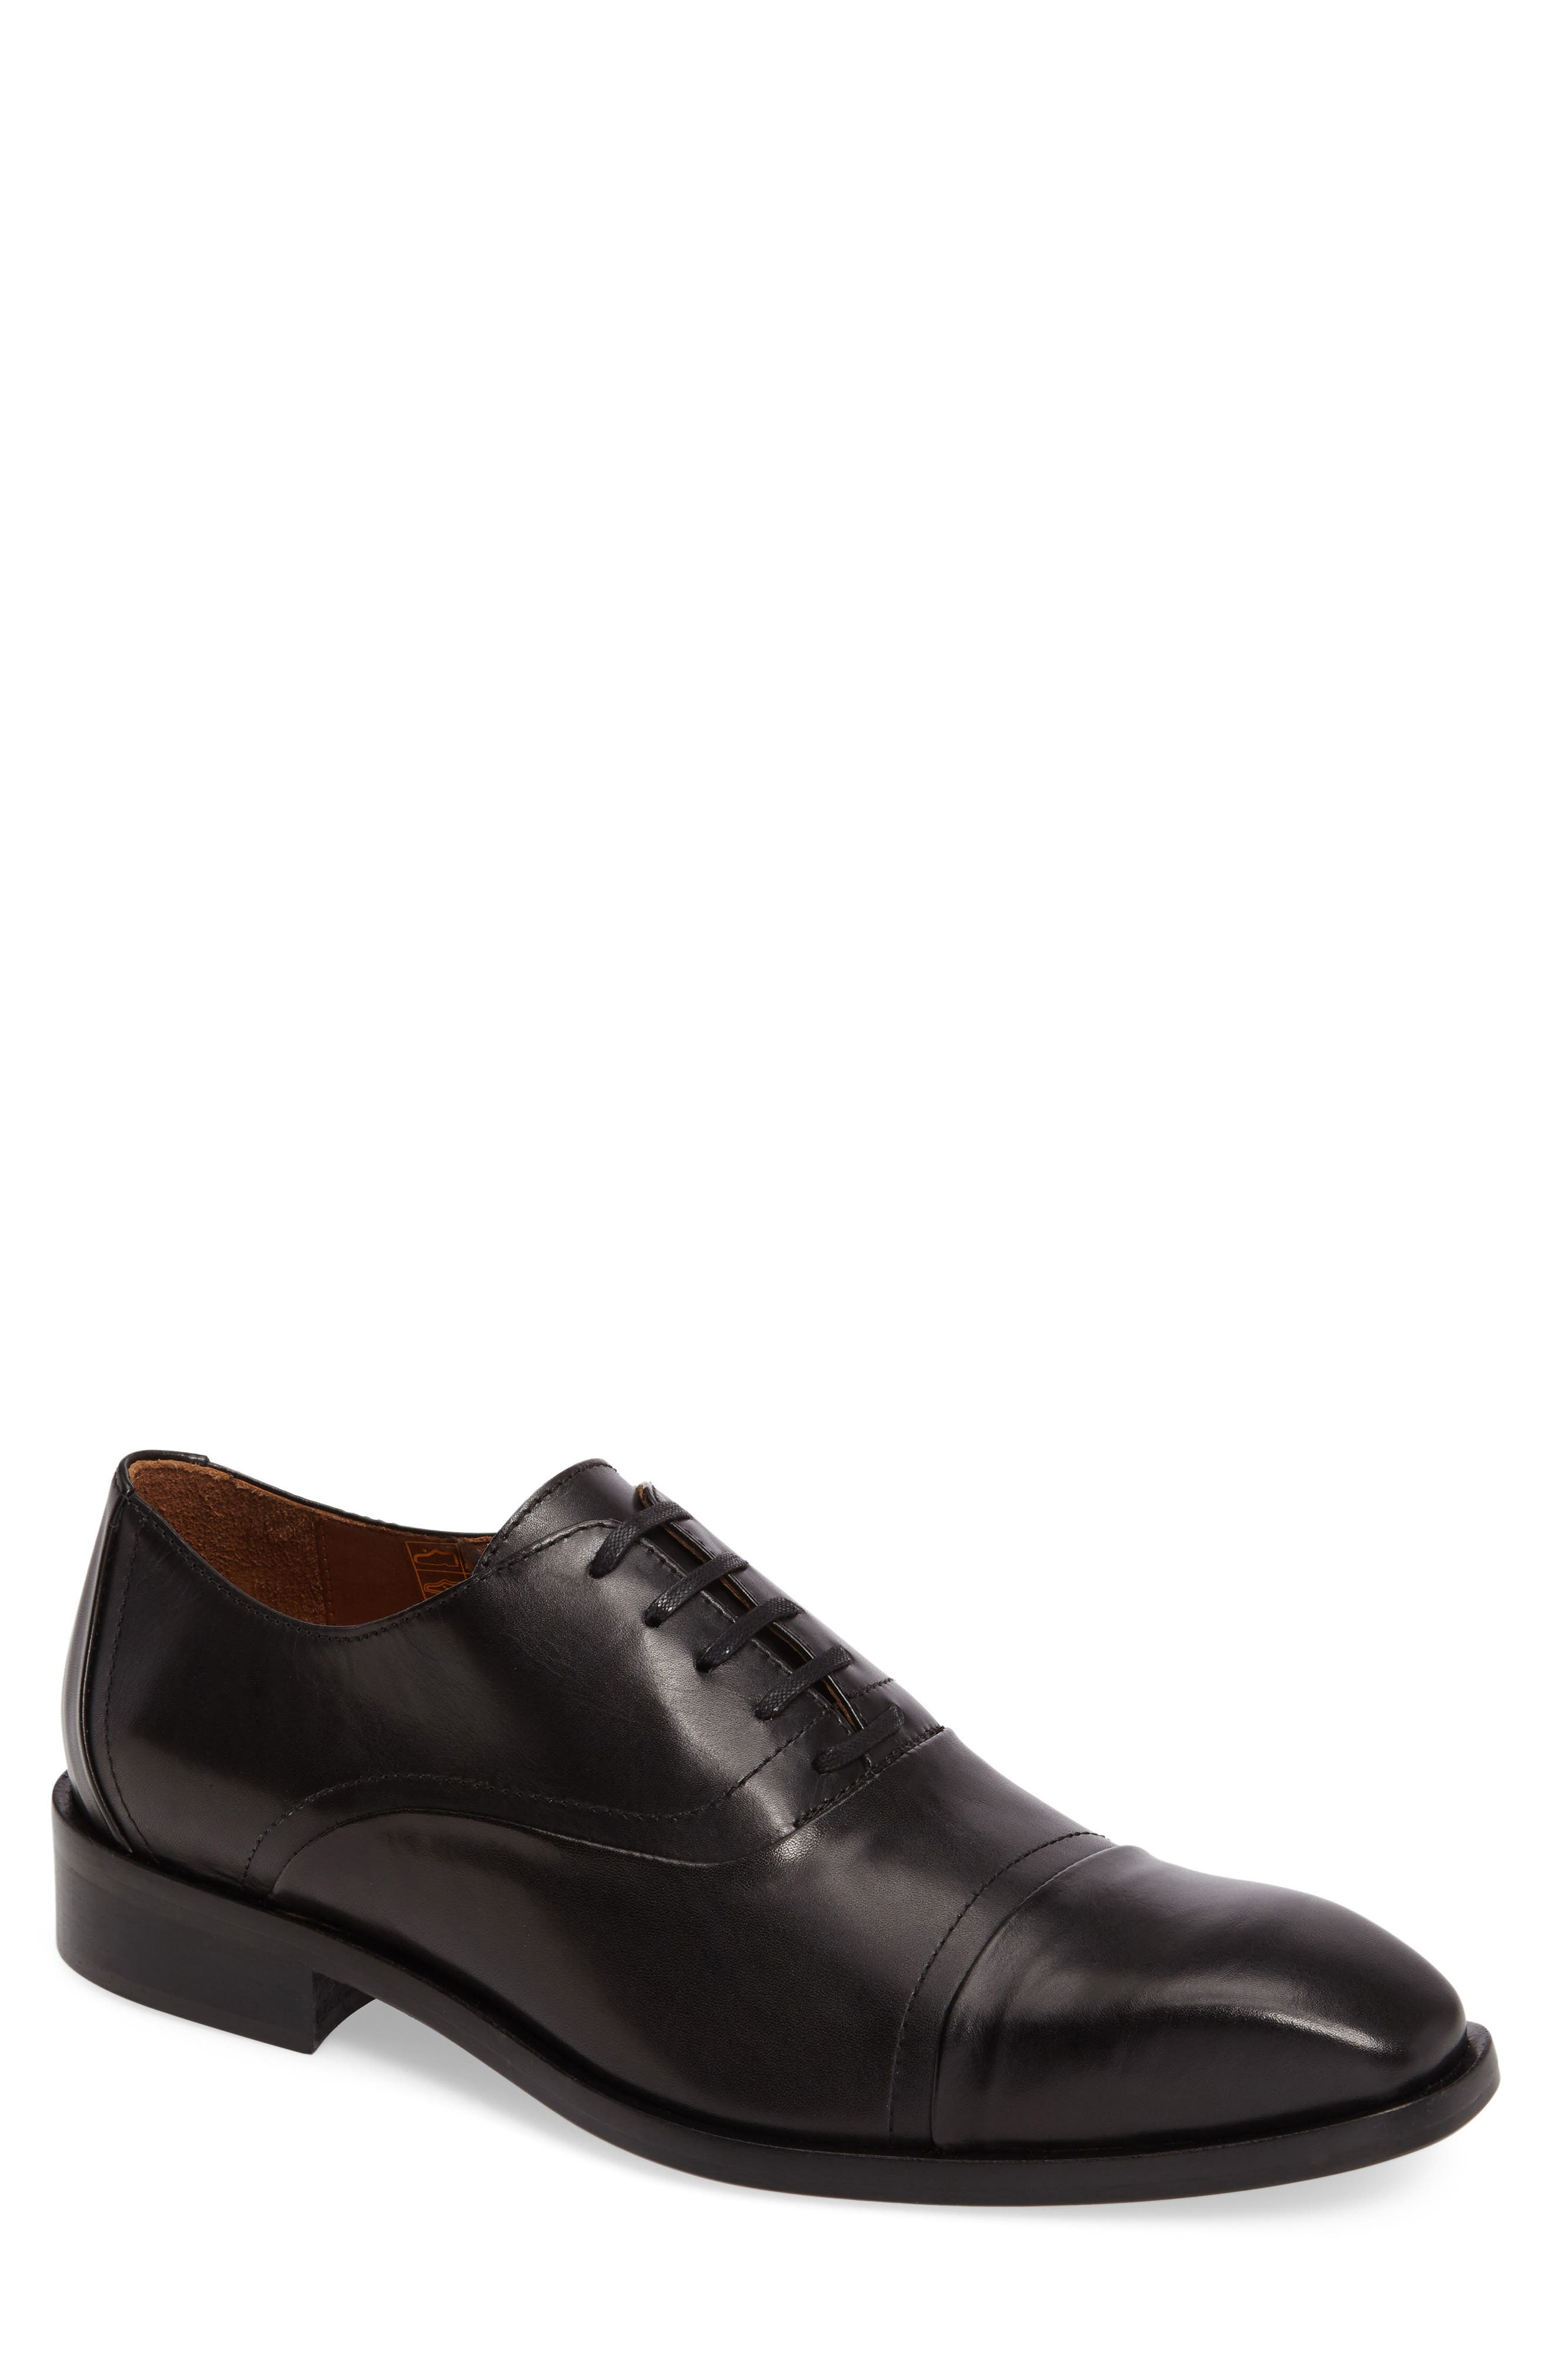 Valerico Cap Toe Oxford,                             Main thumbnail 1, color,                             Black Leather